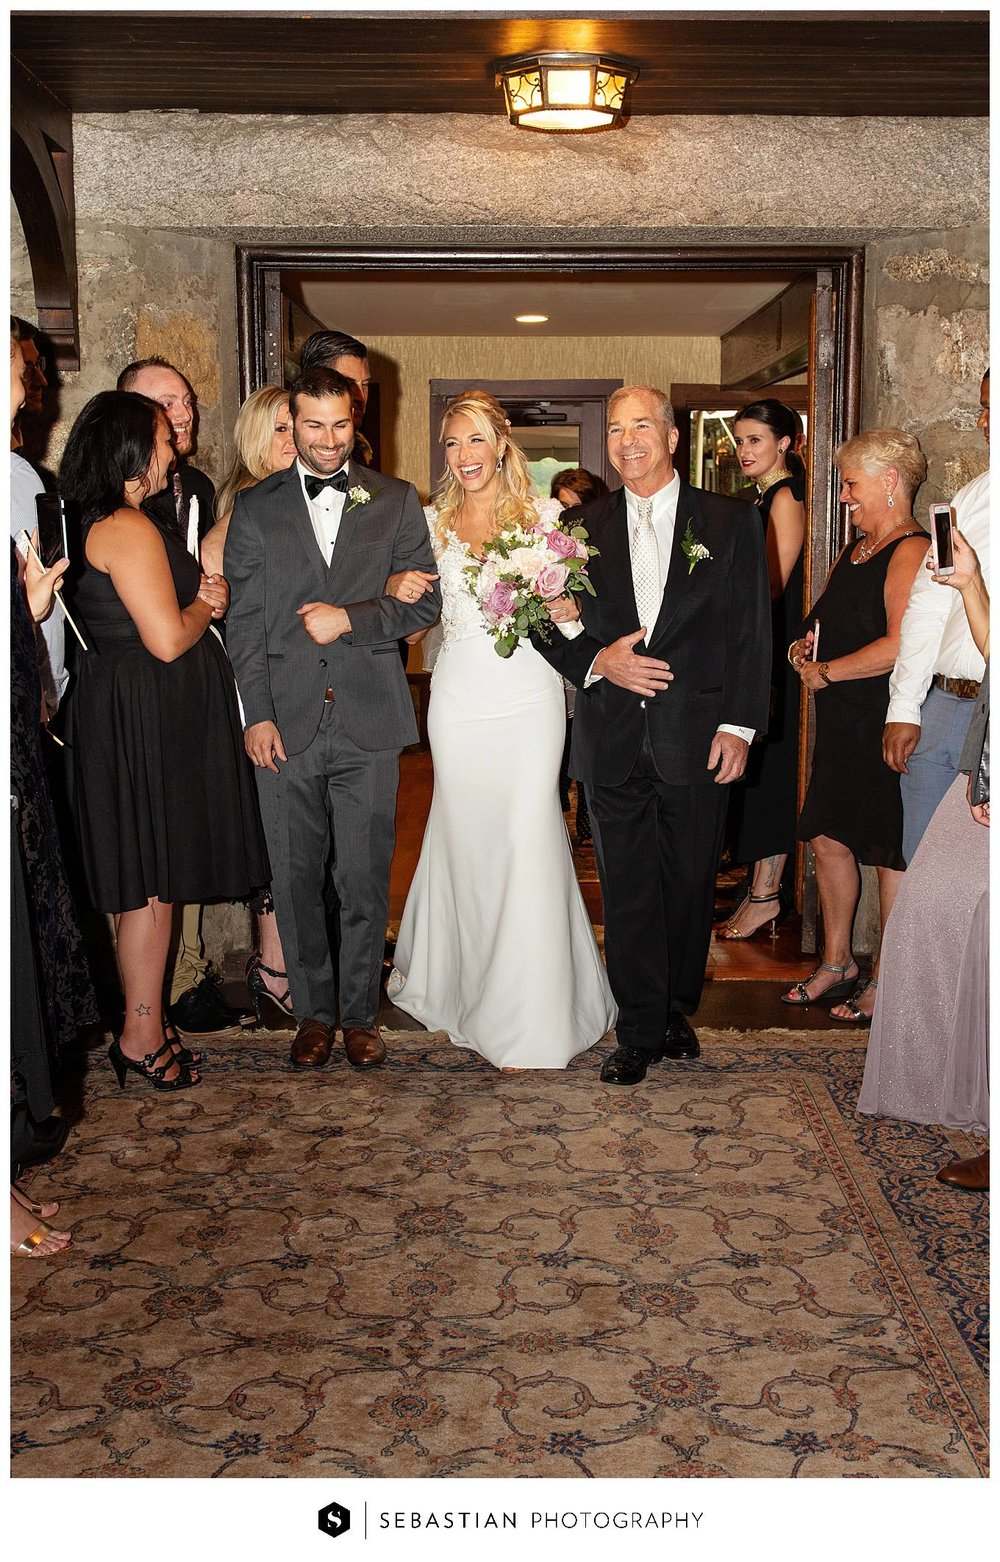 Sebastian Photography_Saint Clements Castle Wedding_CT Wedding Photographer__7053.jpg